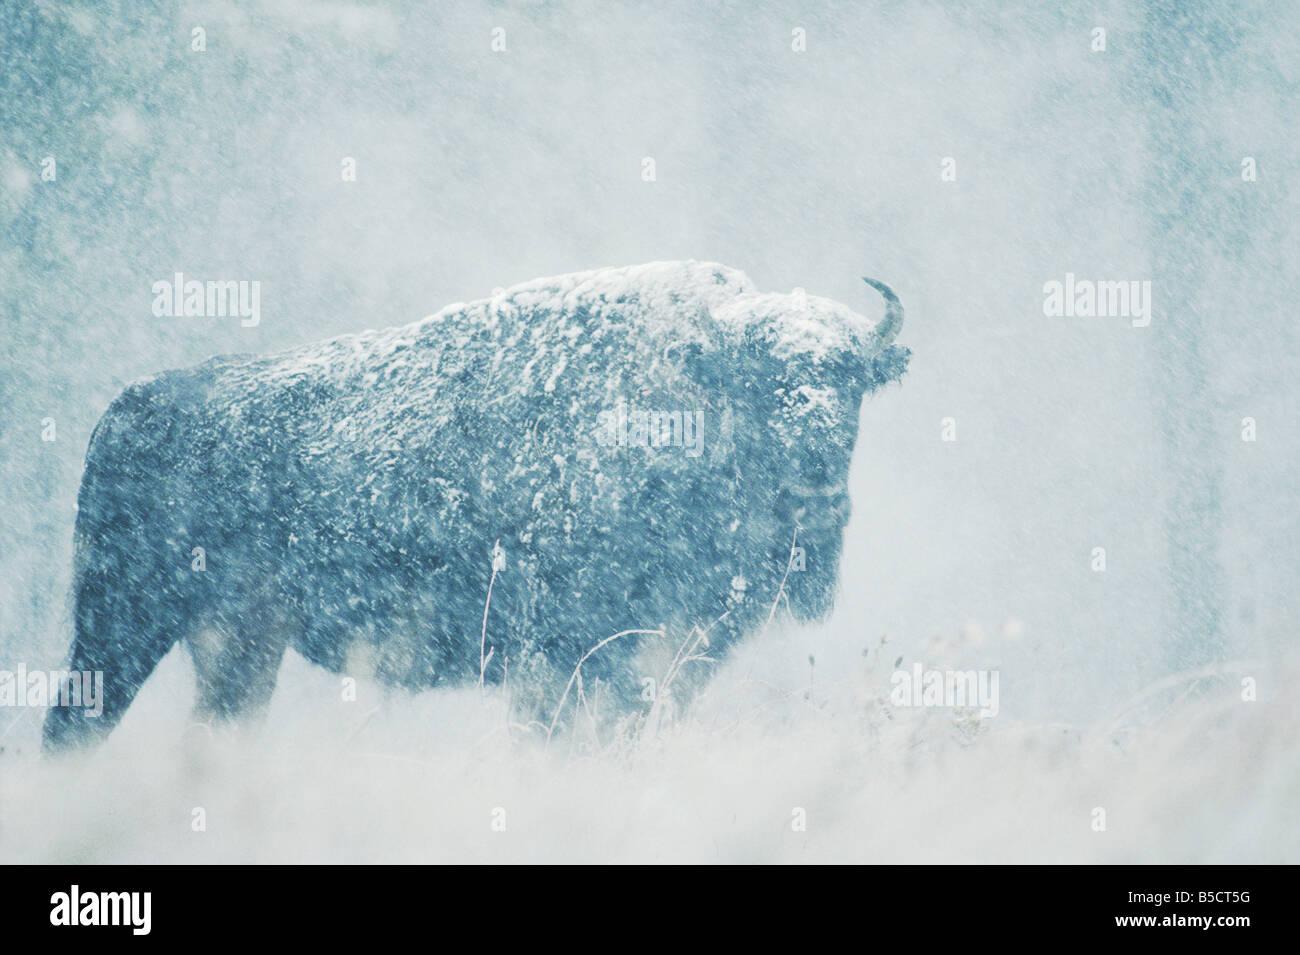 American Buffalo Bison Bison bison adulto en tormenta de nieve Custer State Park, South Dakota, EE.UU. Imagen De Stock